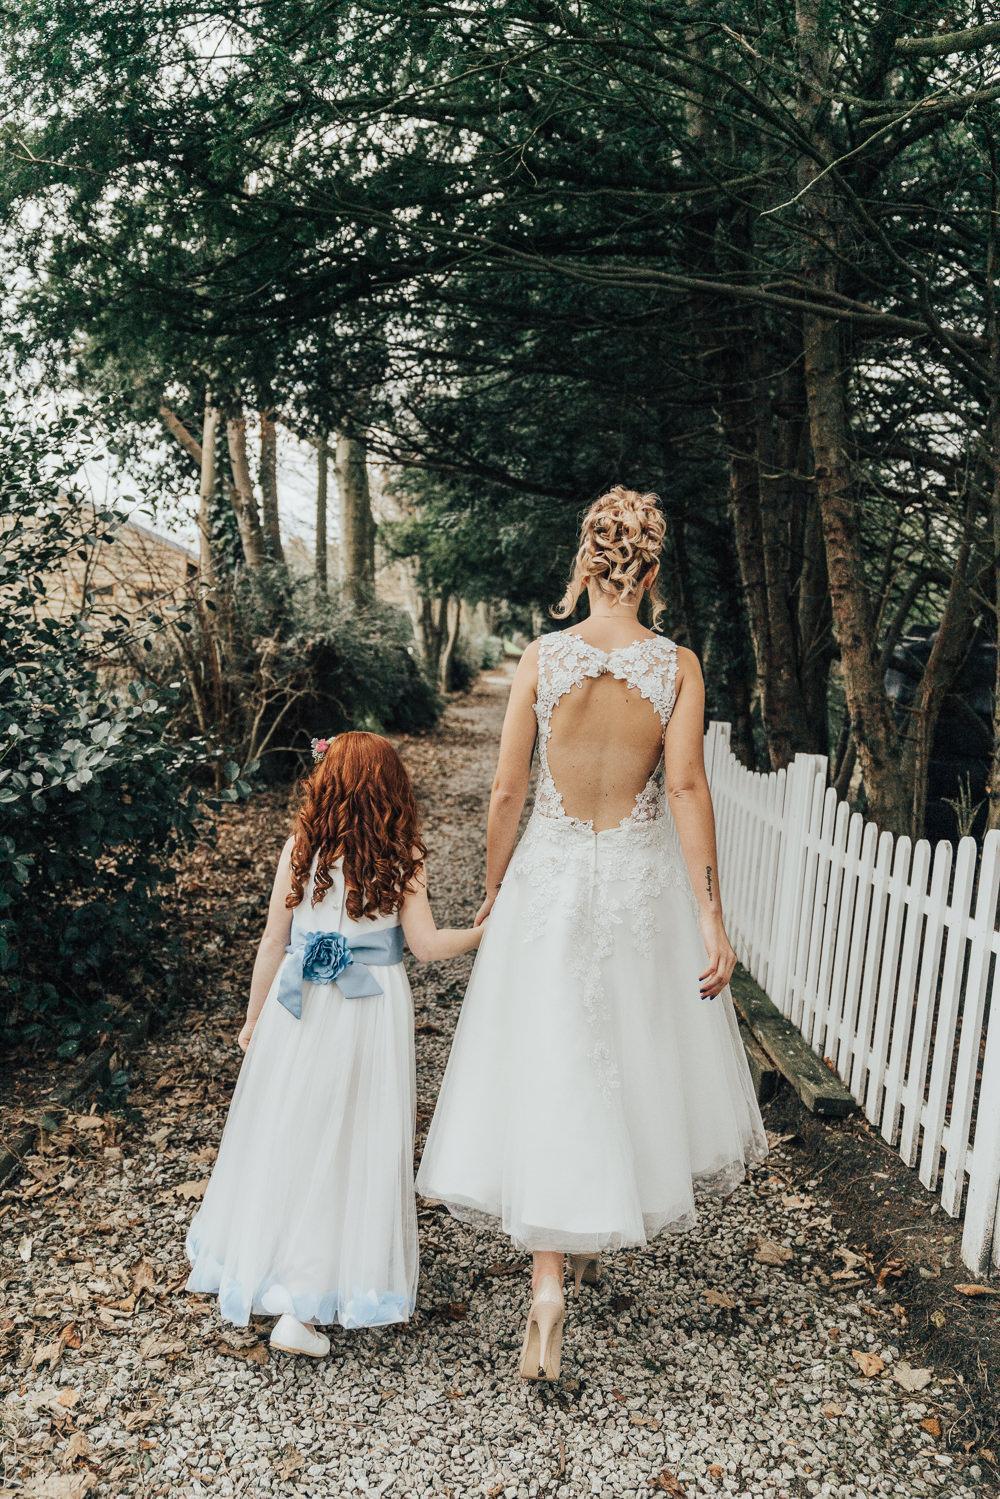 Short Dress Bride Bridal Tea Length Gown Hoop Wedding Ideas Rebecca Carpenter Photography